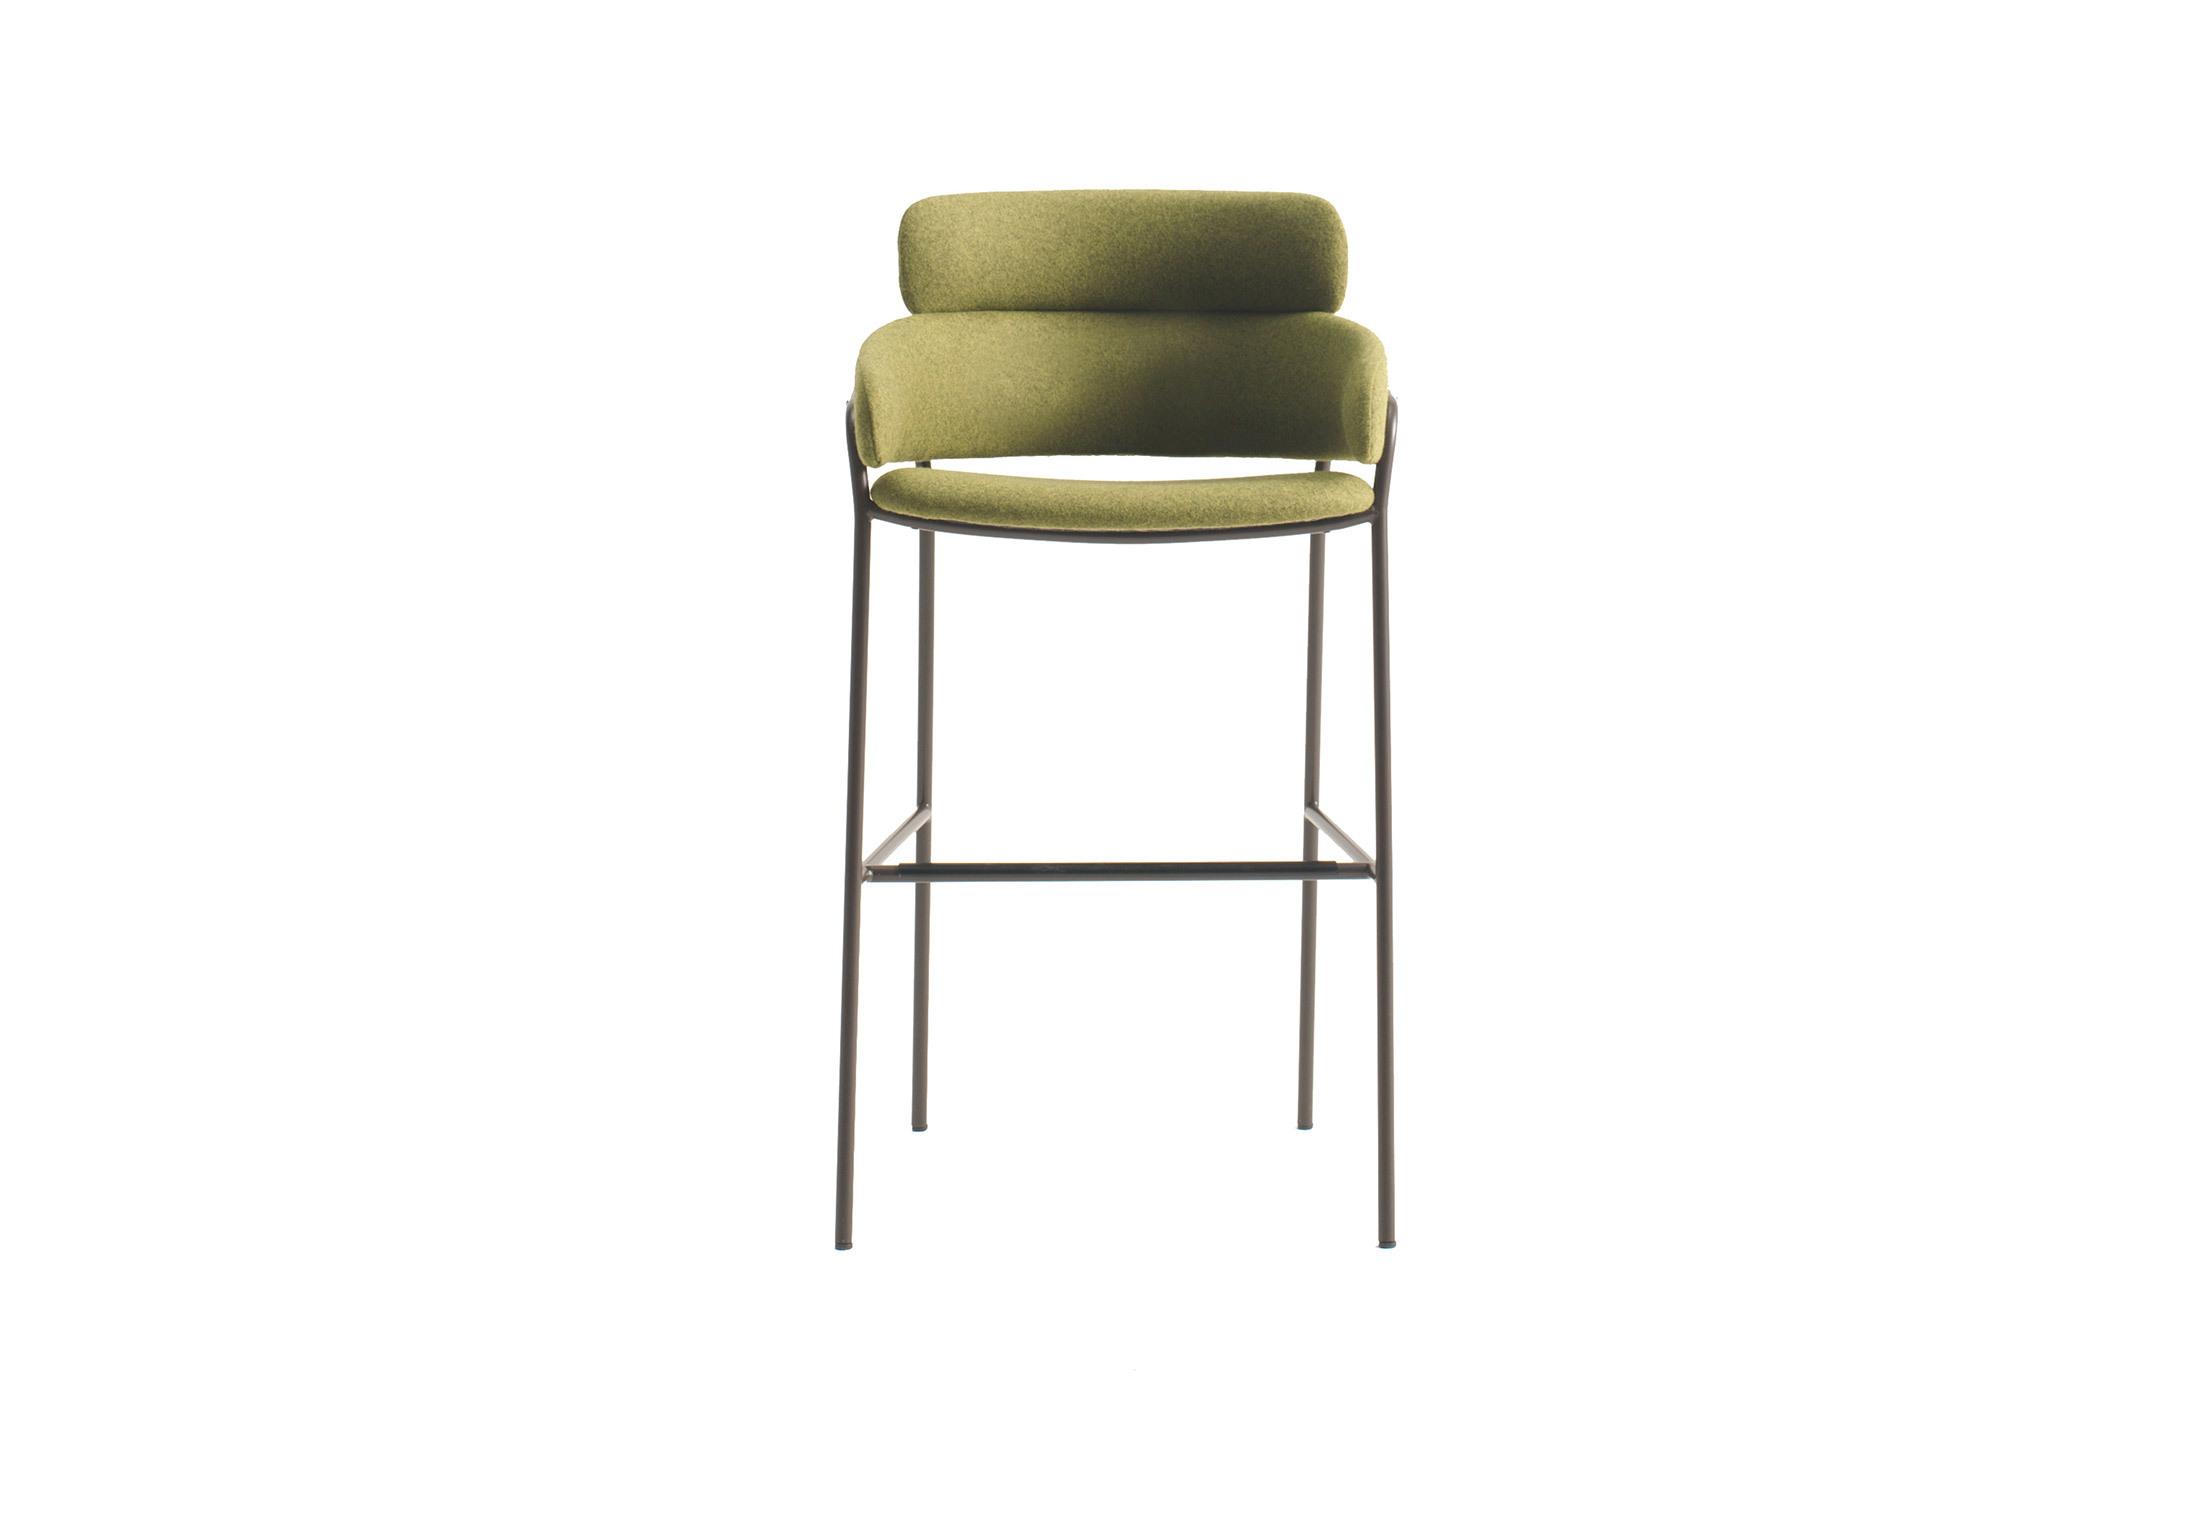 Fabulous Strike St By Arrmet Stylepark Andrewgaddart Wooden Chair Designs For Living Room Andrewgaddartcom